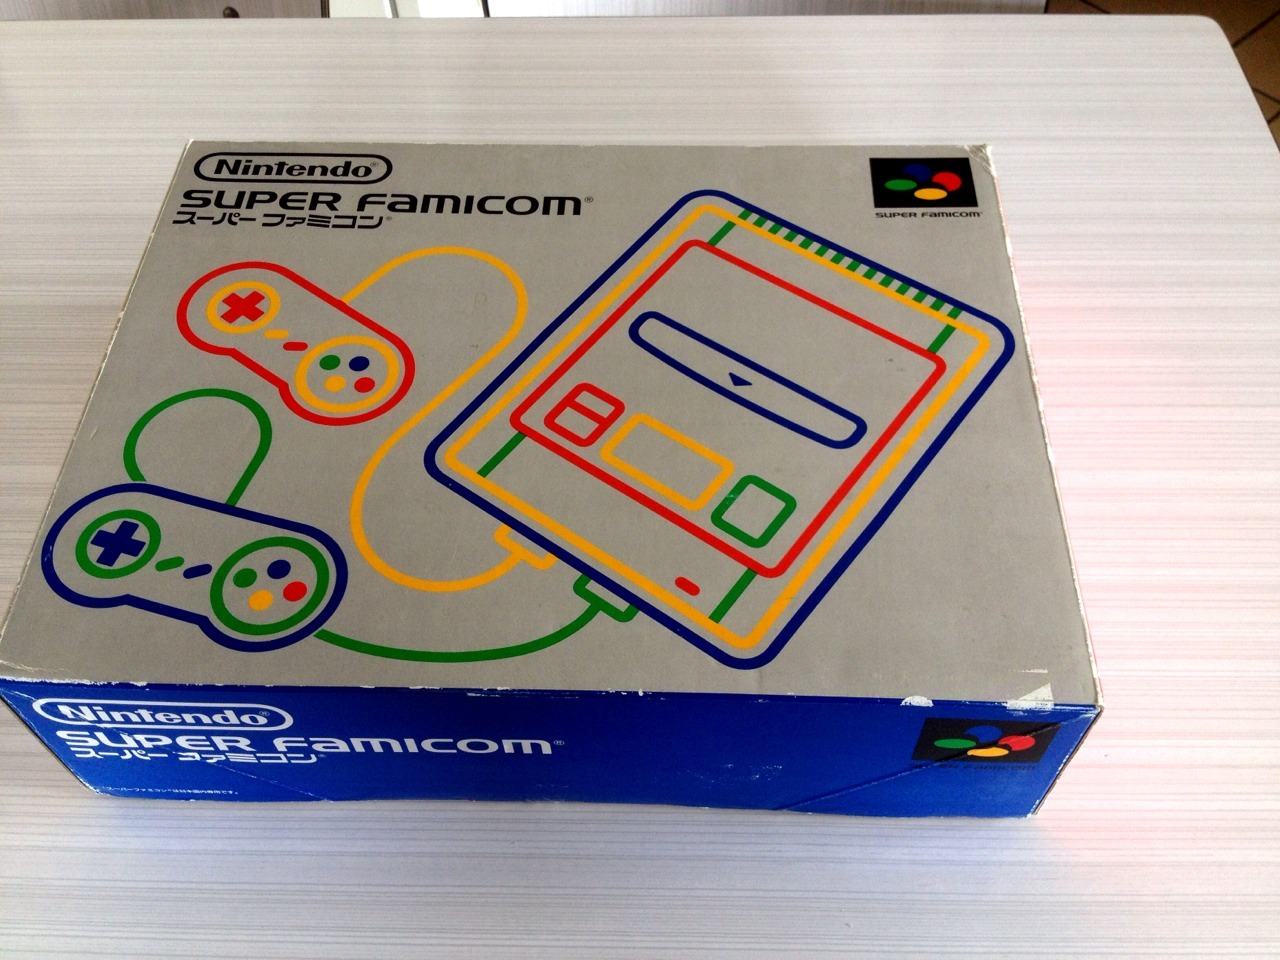 Super Famicom: quelle alimentation? Tumblr_n4lcheDvUU1qzz13ao1_1280